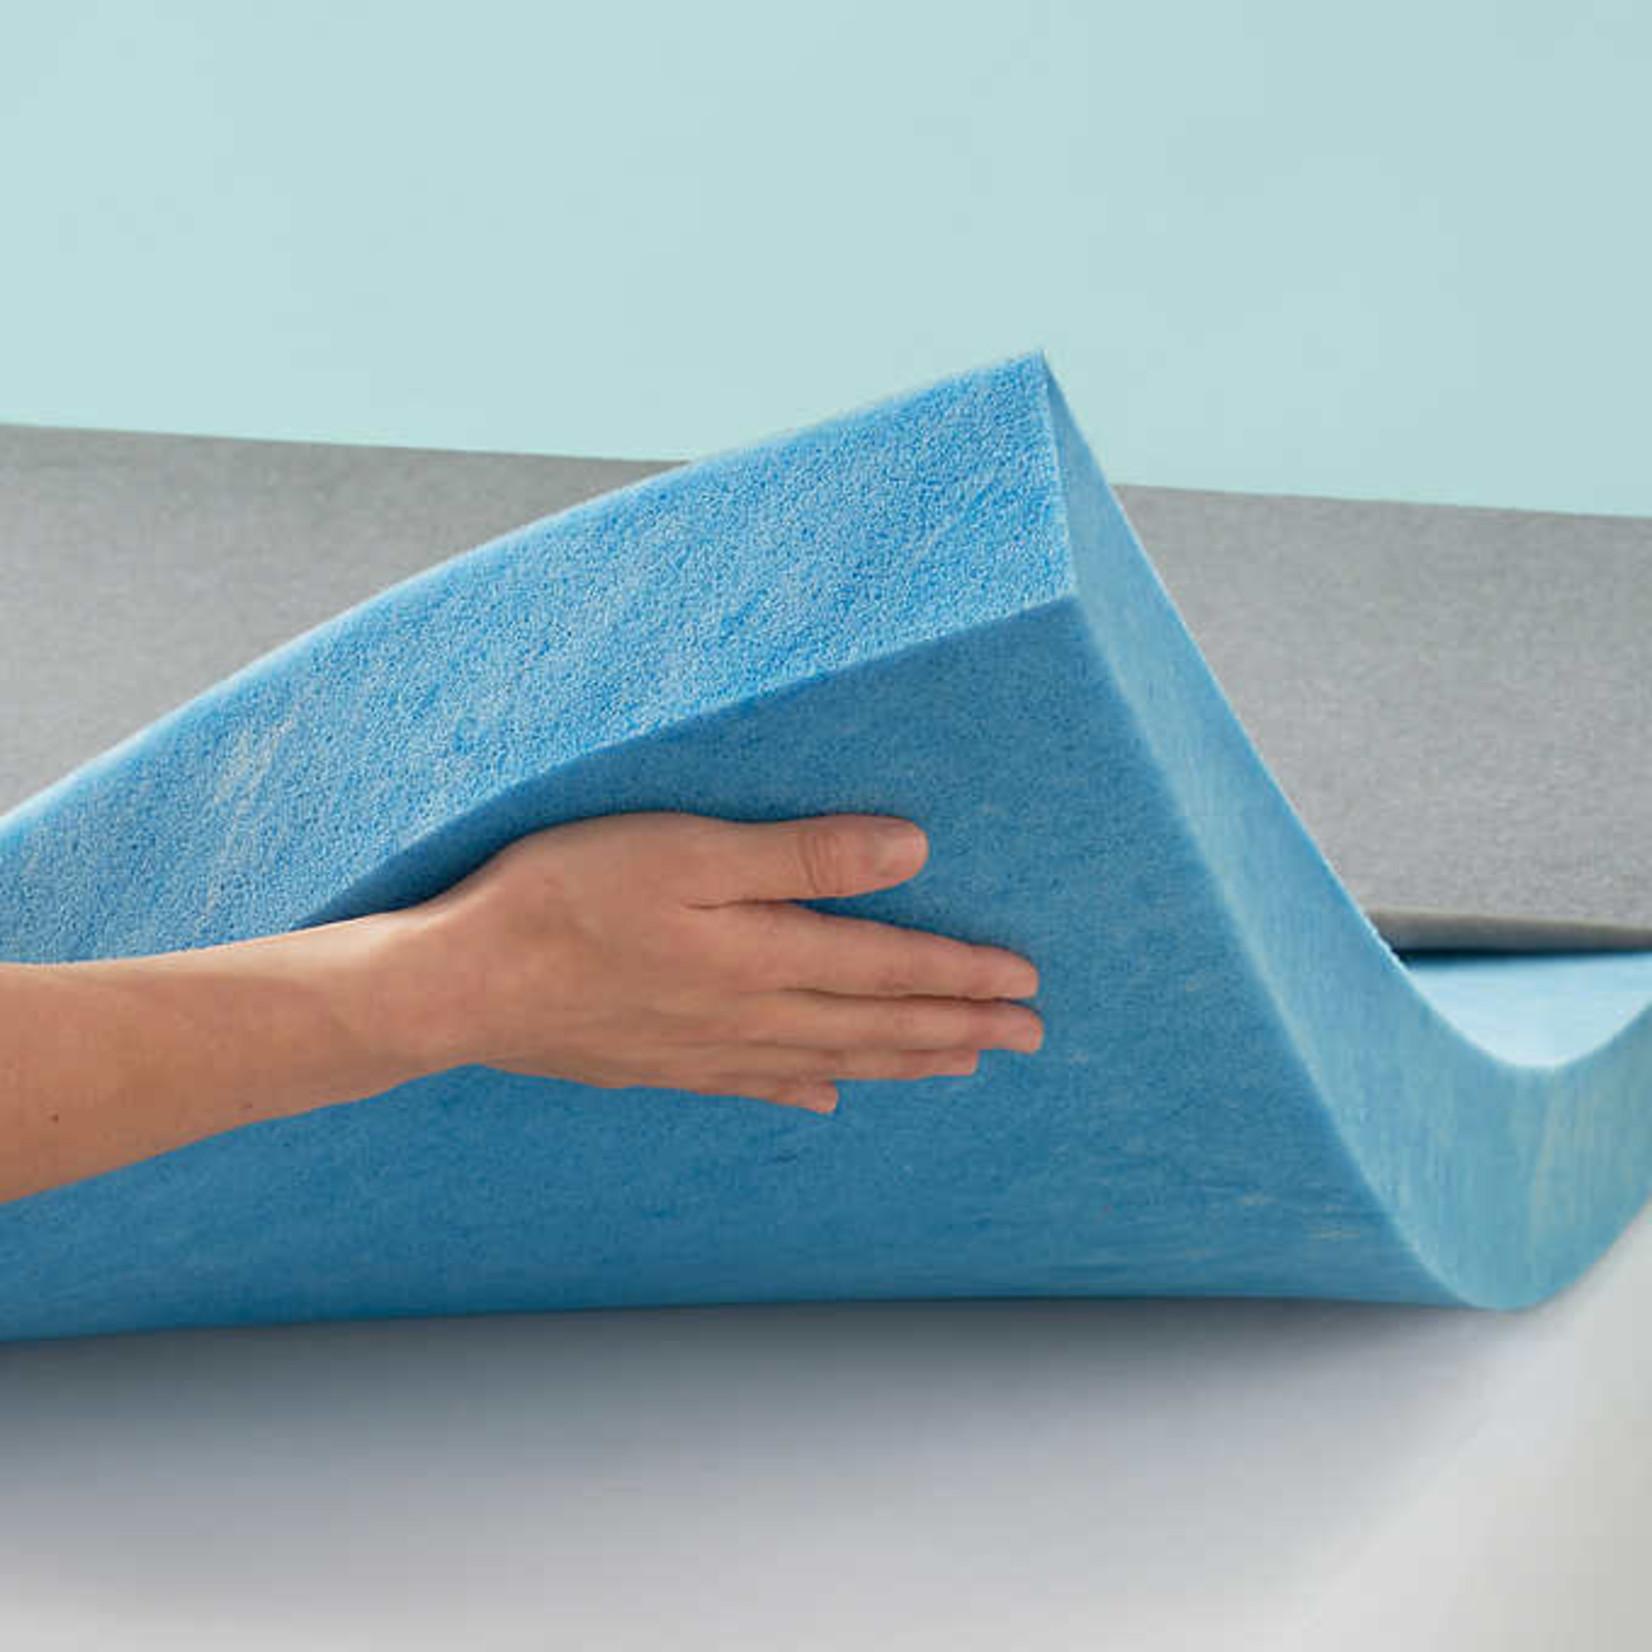 Novaform Soothing Cool EVENcor GelPlus Memory Foam 7.6cm Mattress Topper -DOUBLE